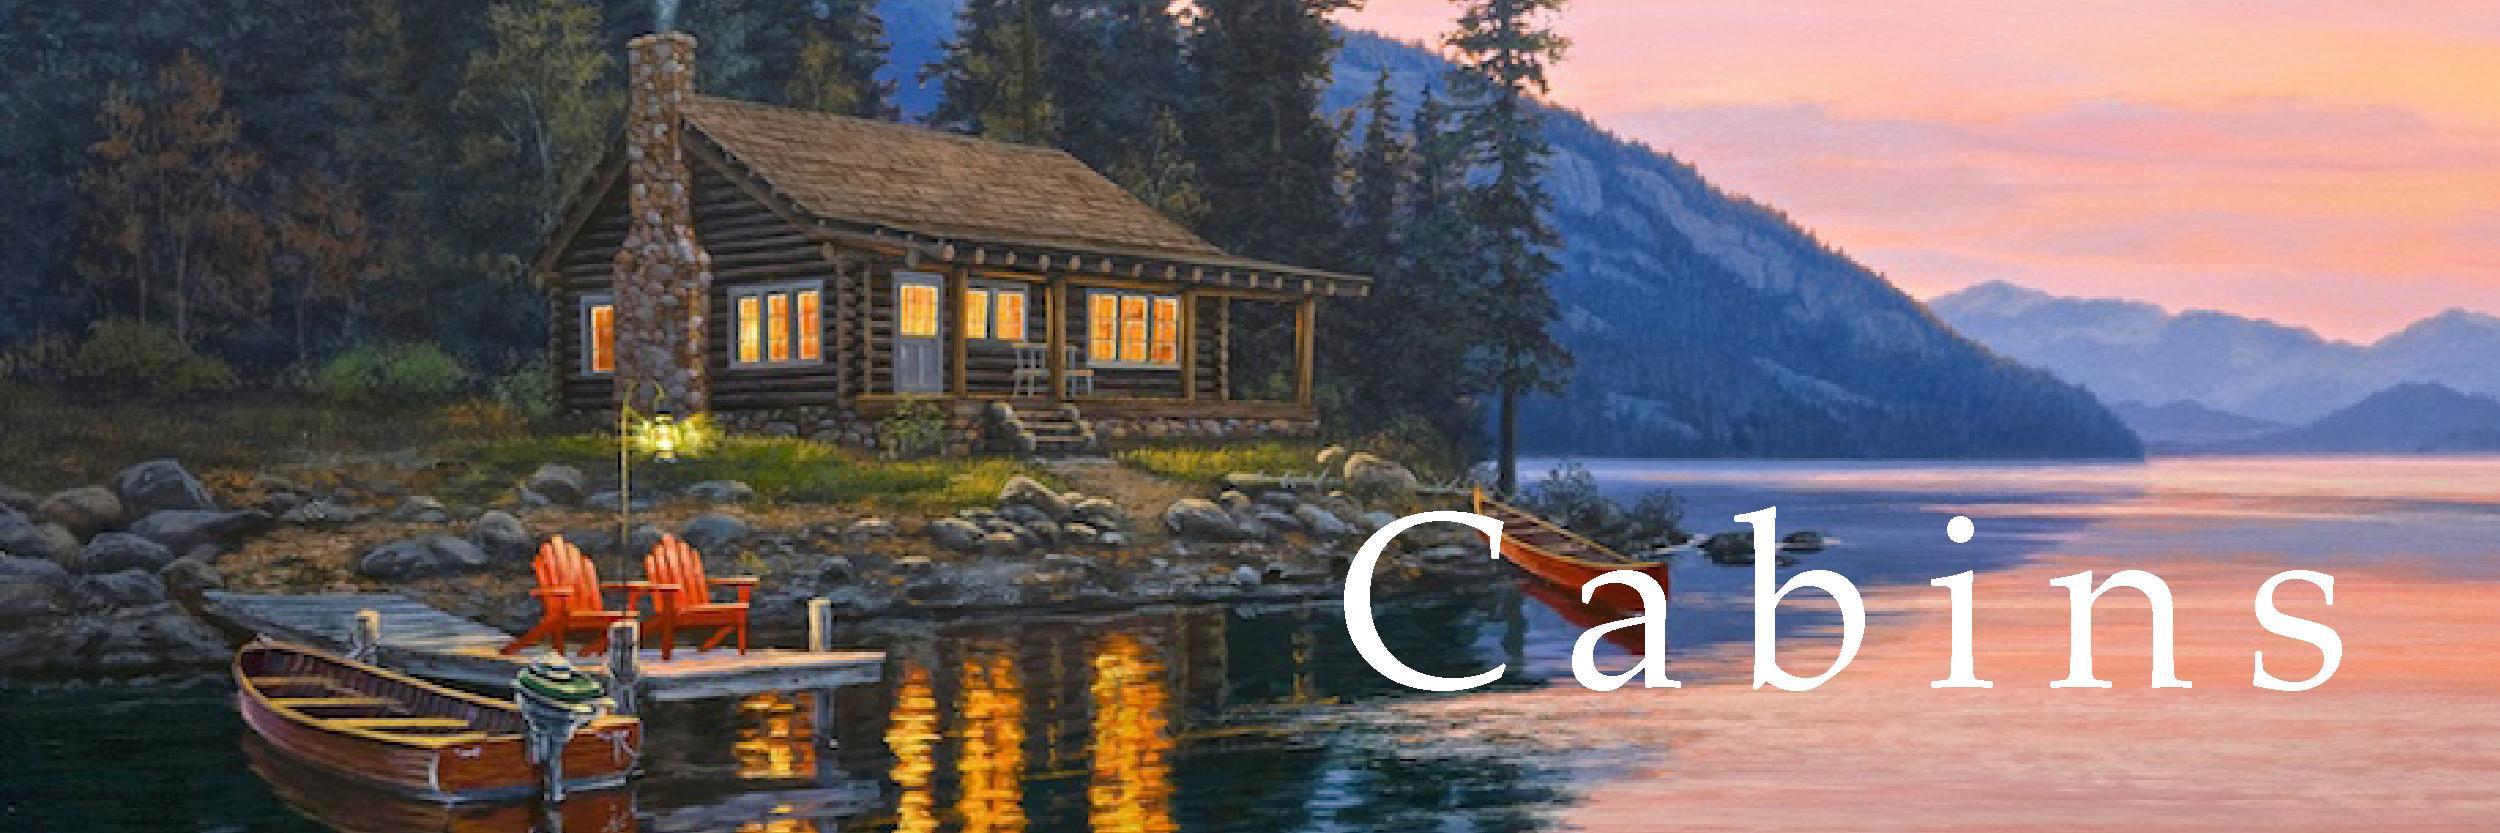 Cabins | DBArt button.jpg